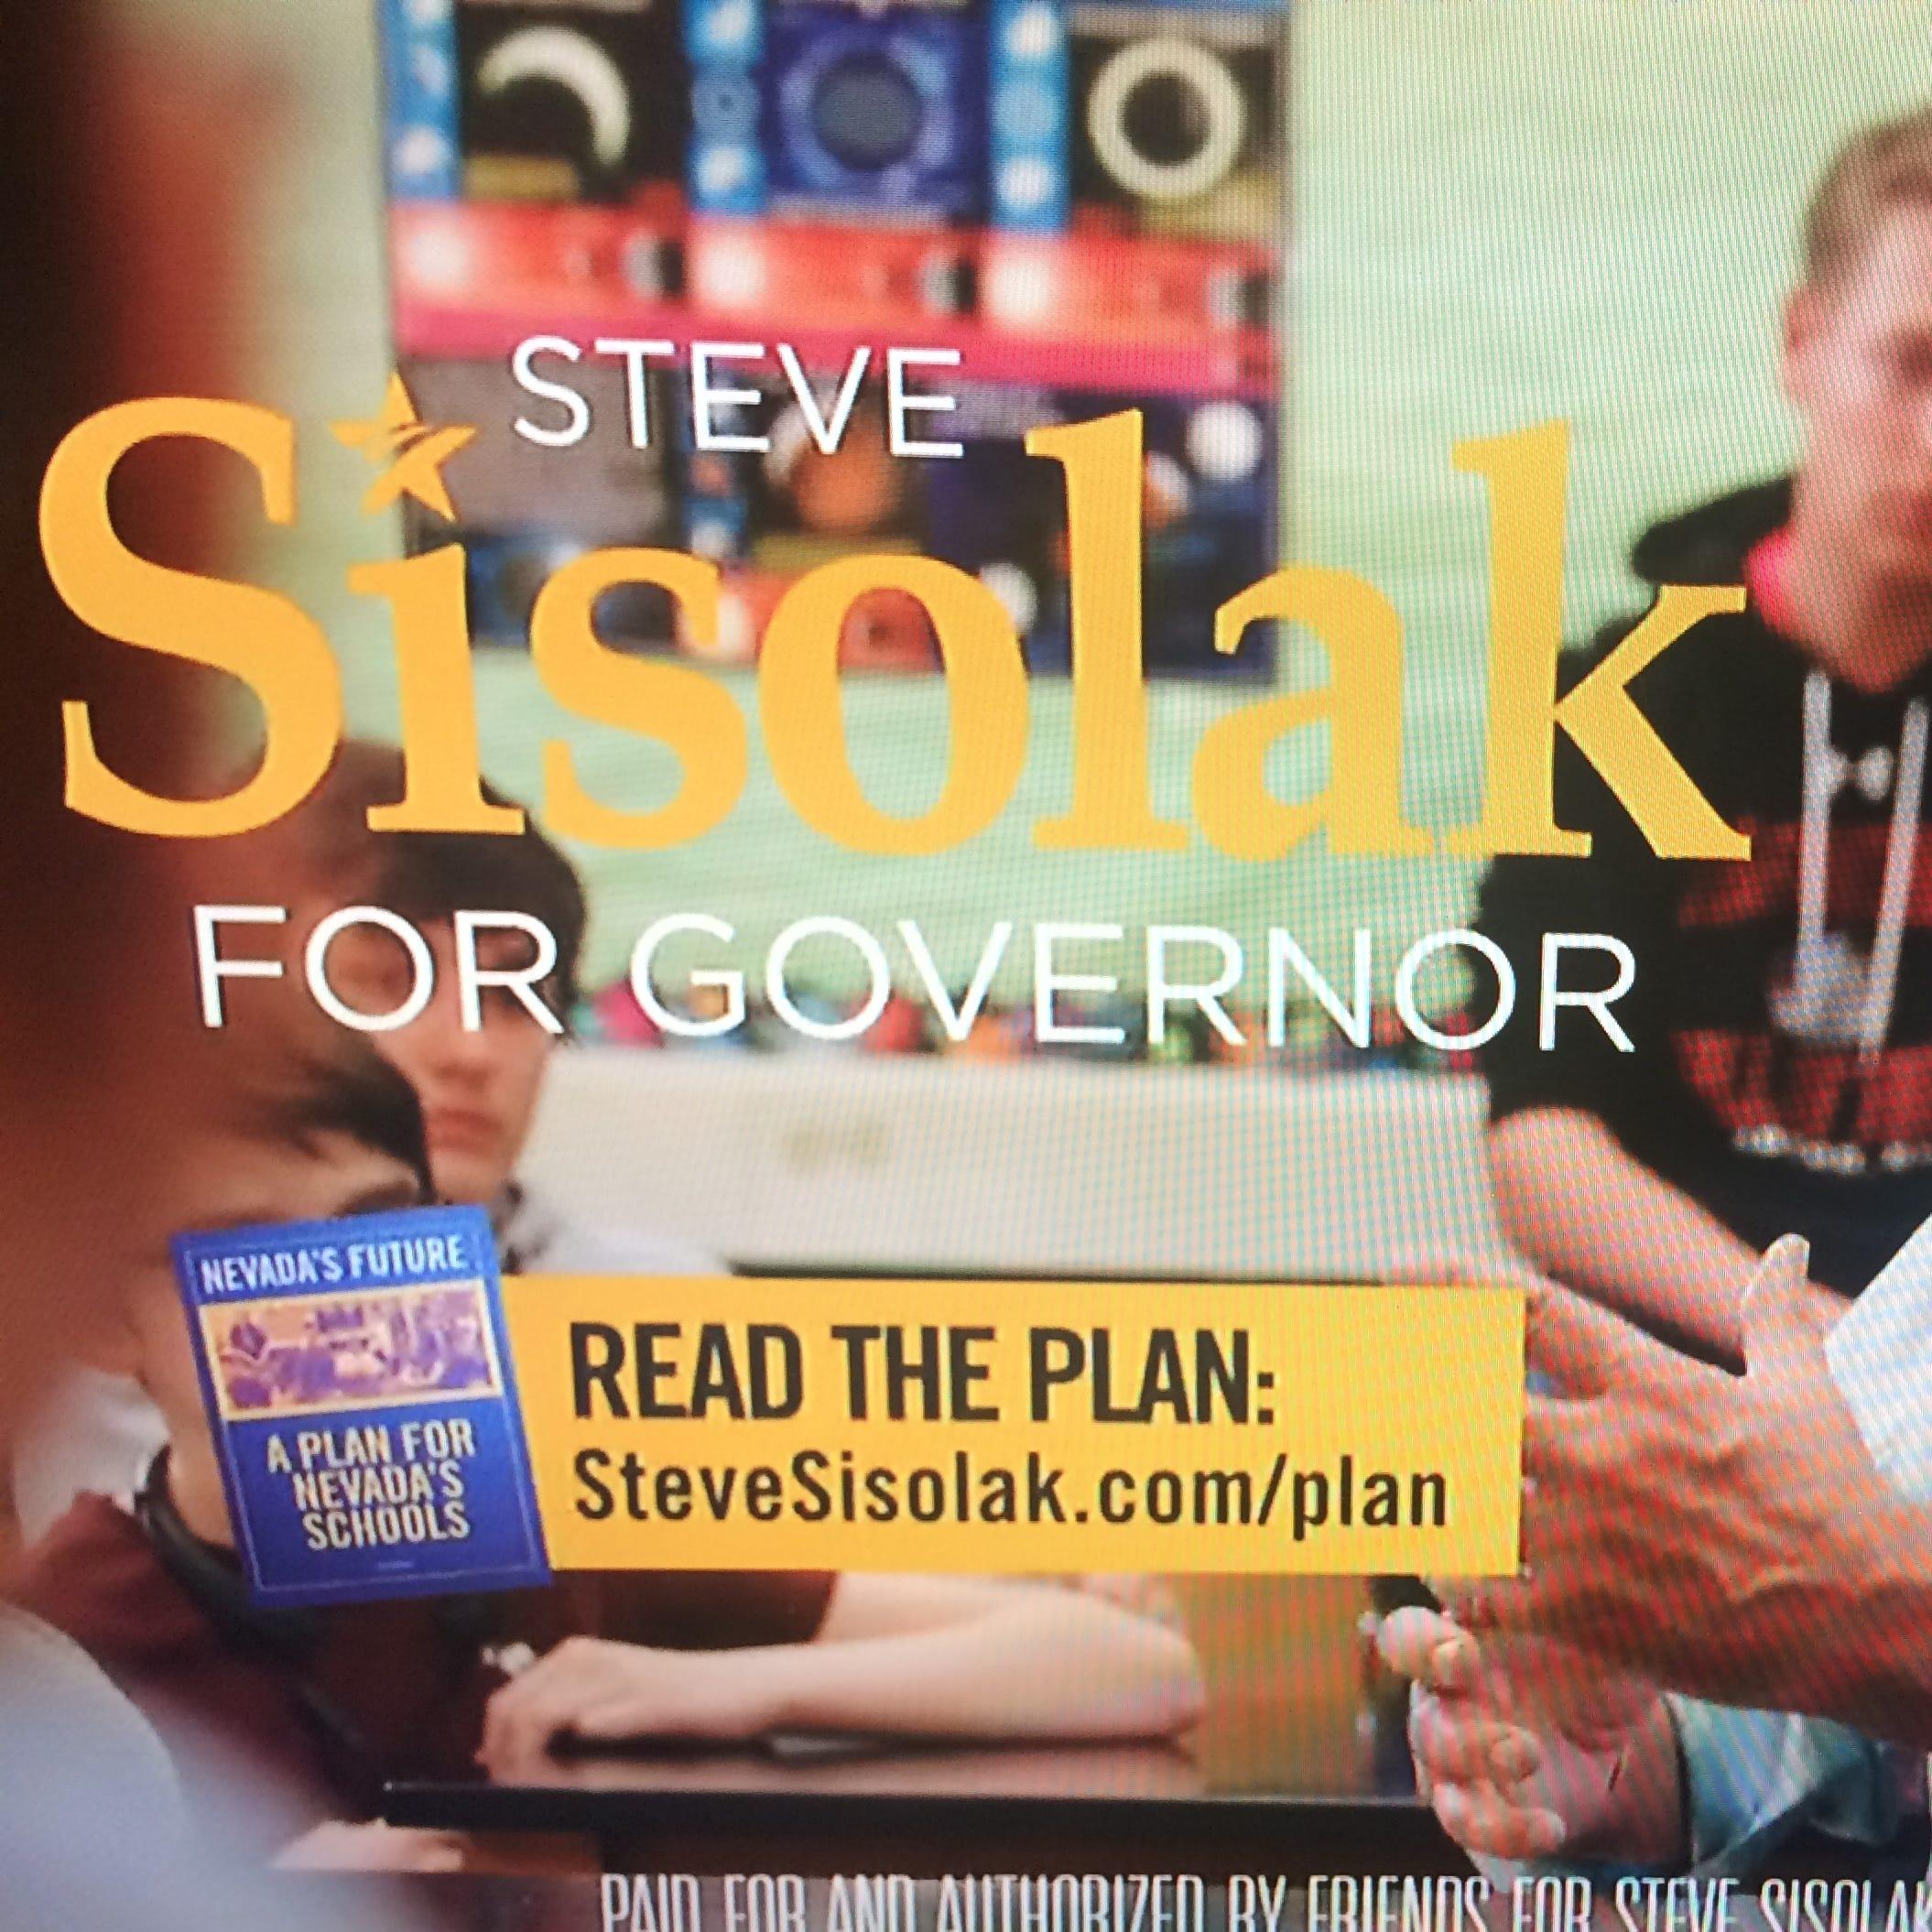 Here's why Nevada political ads air during Arizona Diamondbacks games